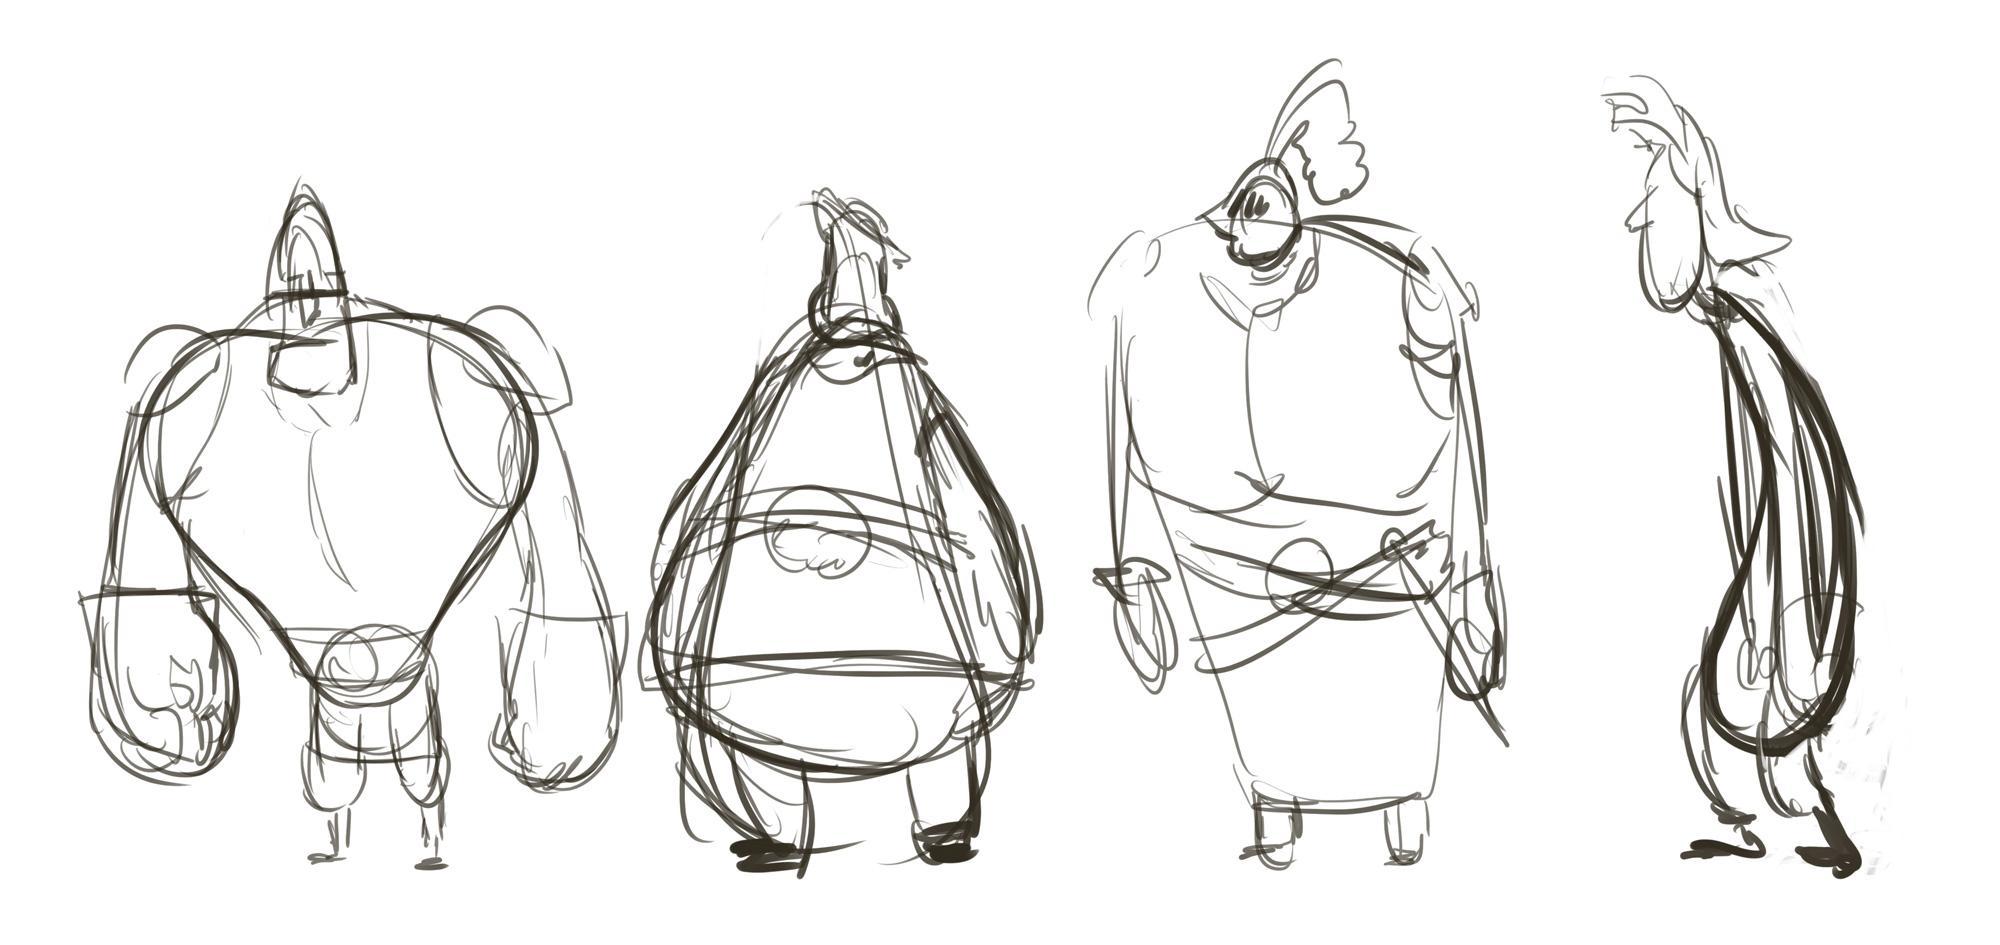 Fatty Guard - image 1 - student project